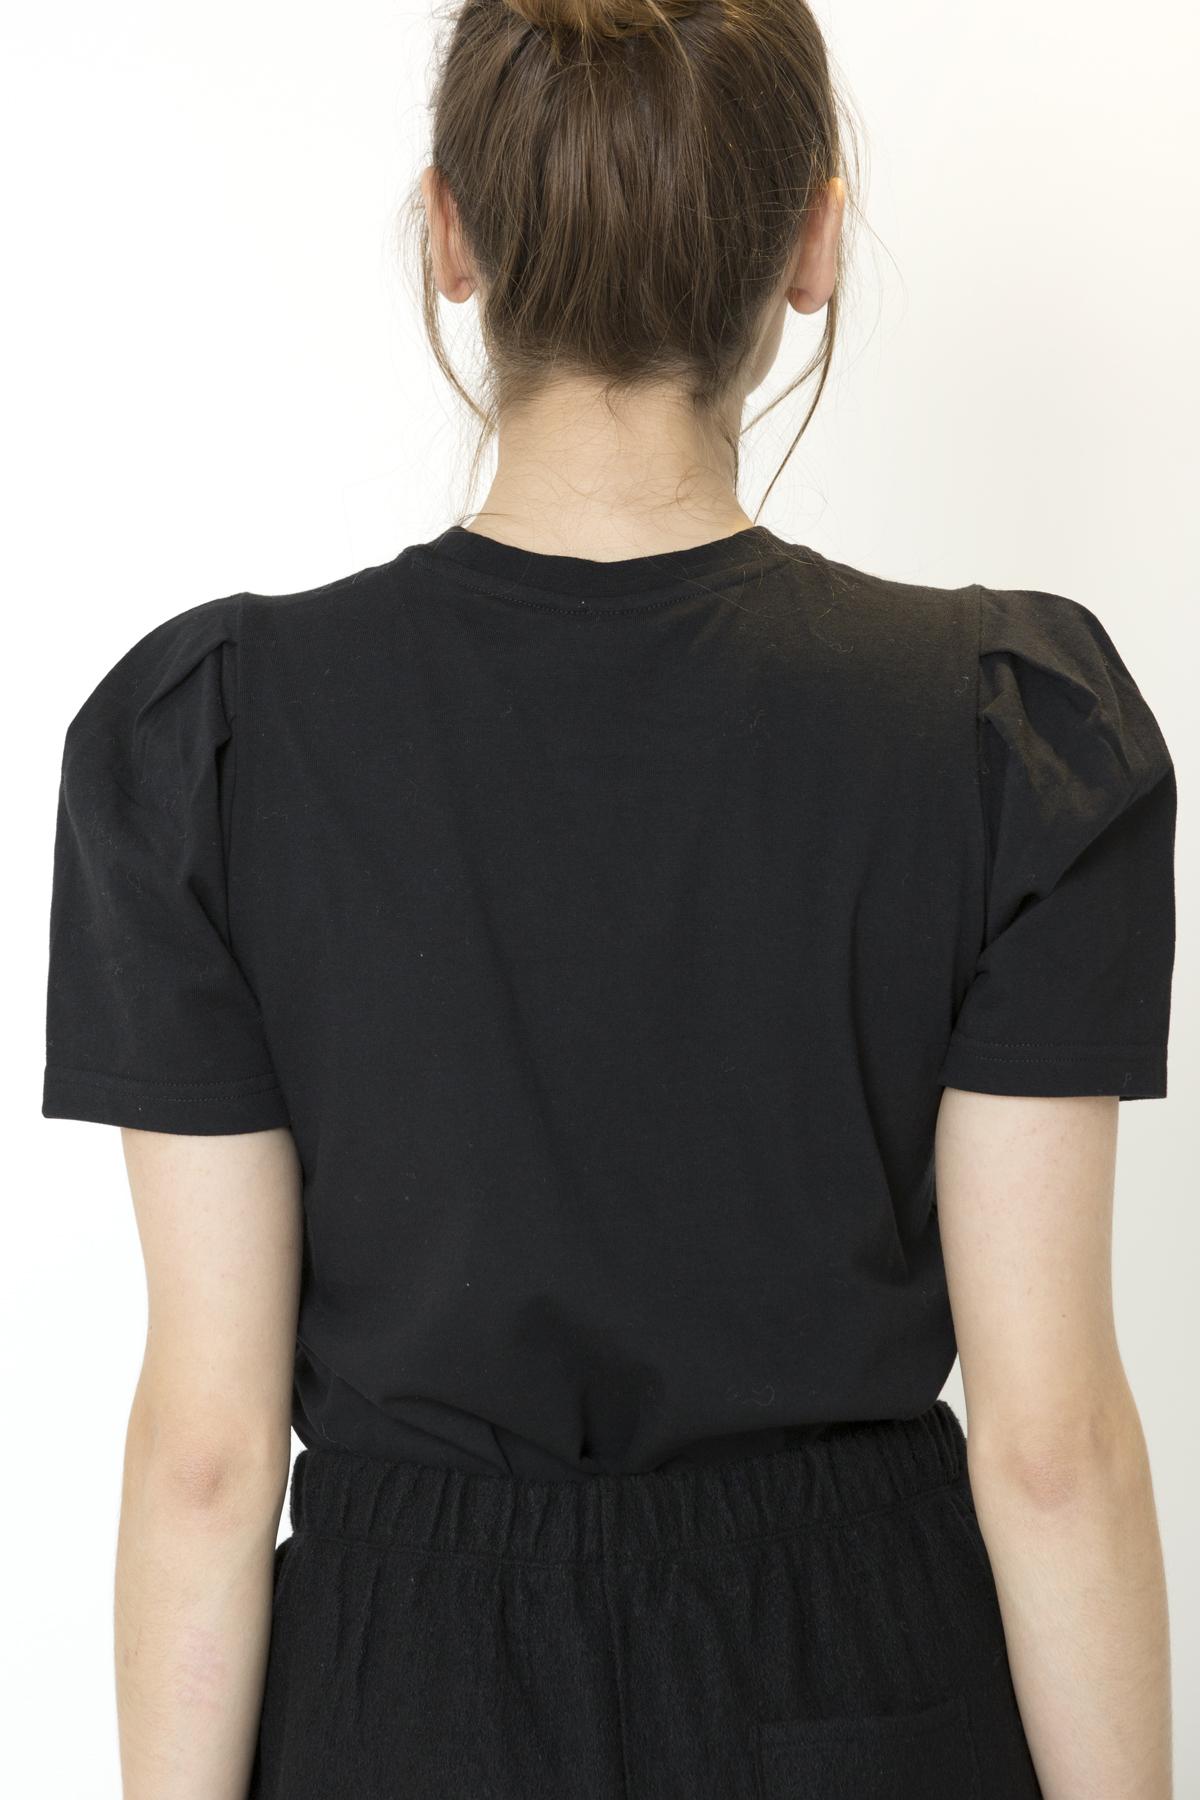 isa-top-black-twist-tango-tshirt-cotton-matchboxathens